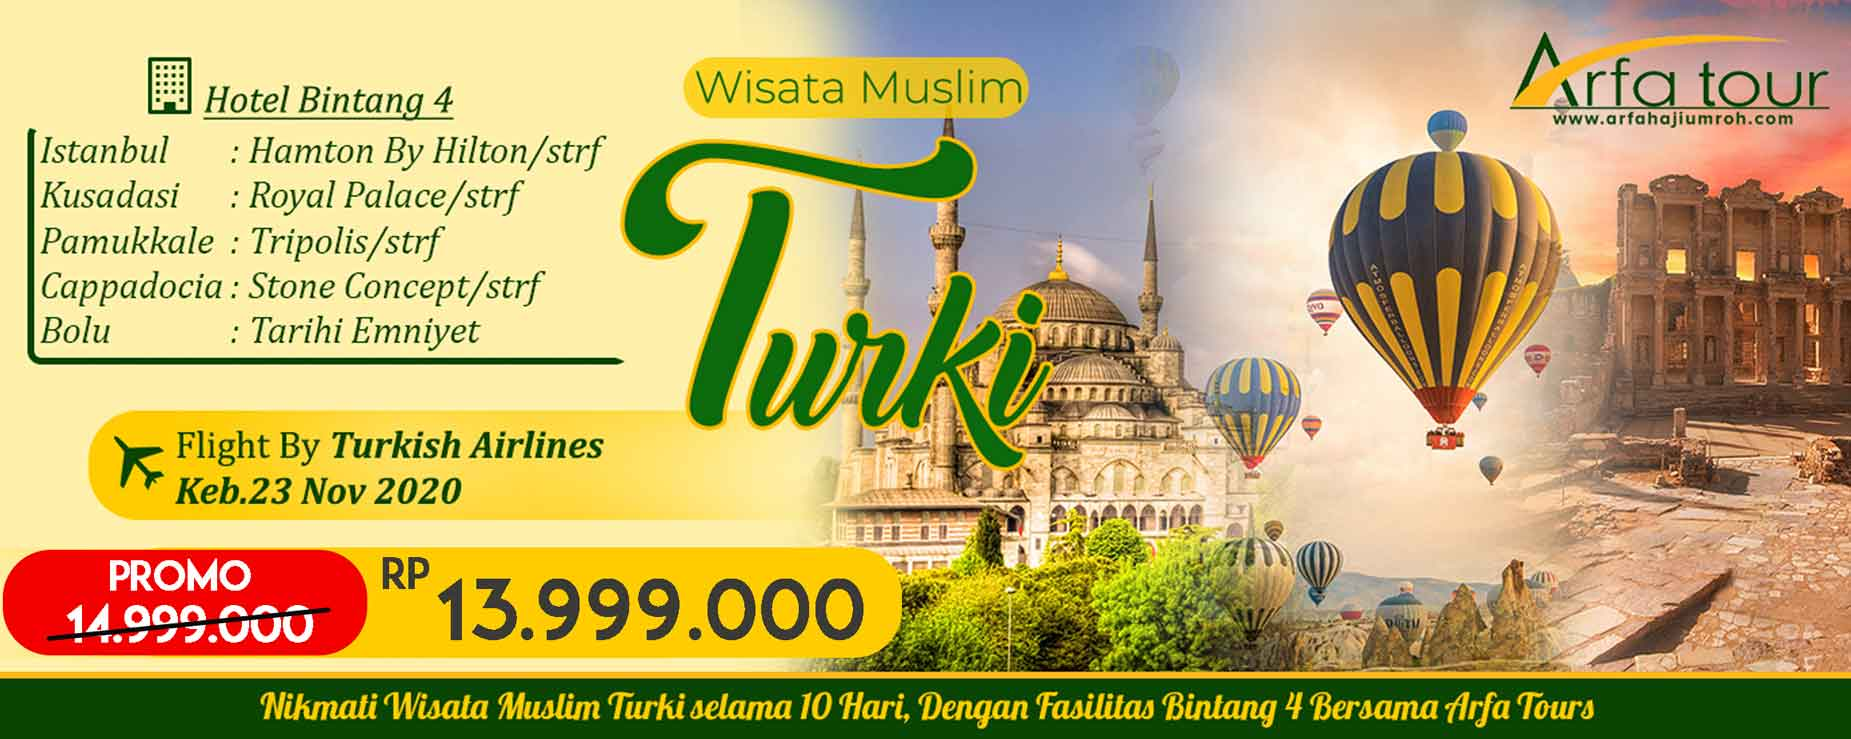 wisata turki halal promo